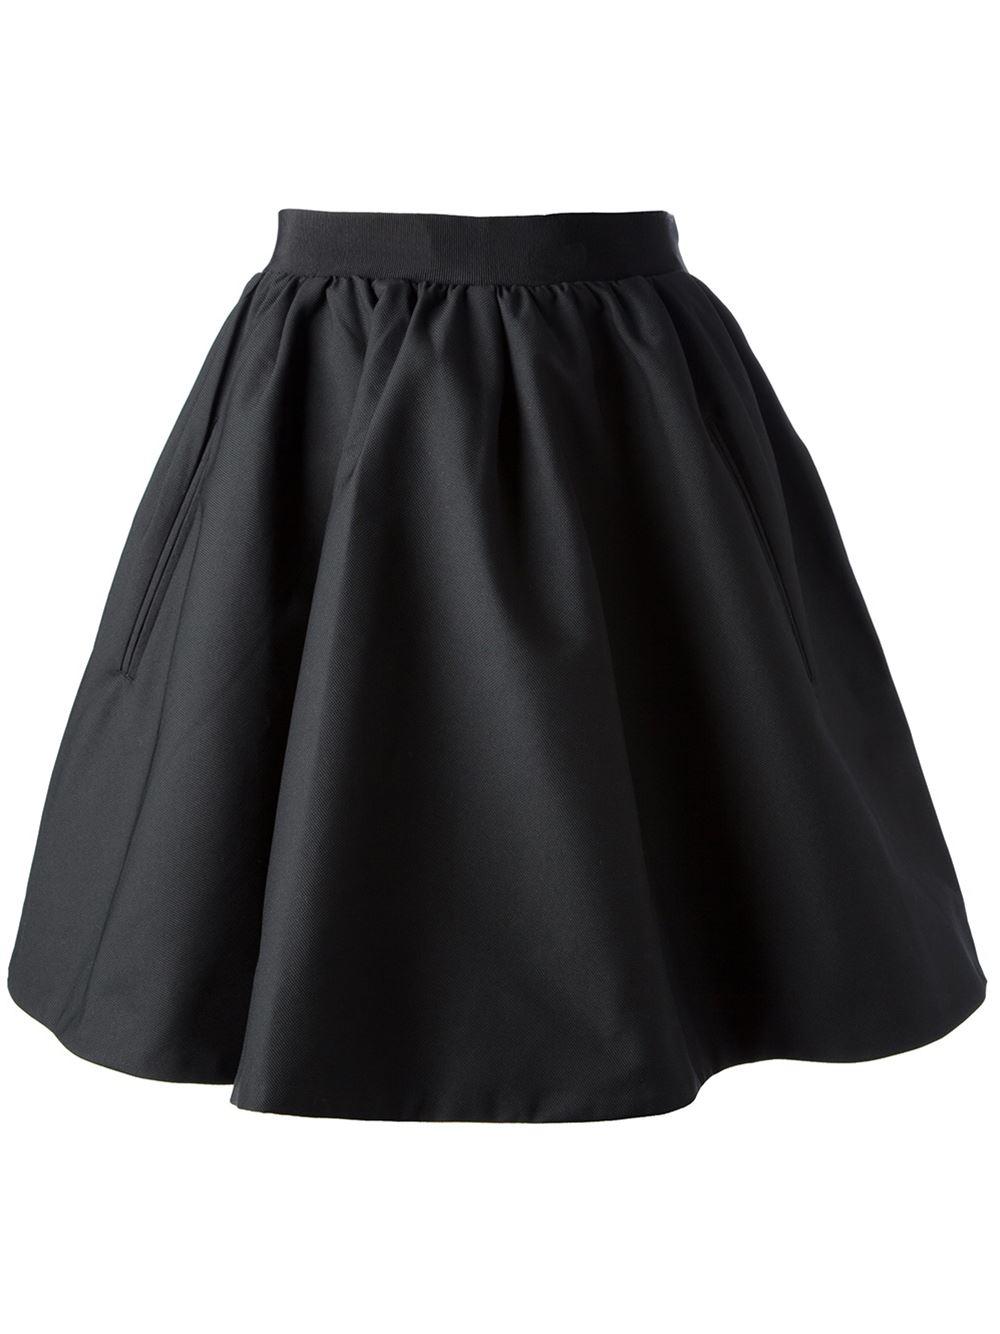 Acne Studios 'romantic' Skirt - Start - Farfetch.com